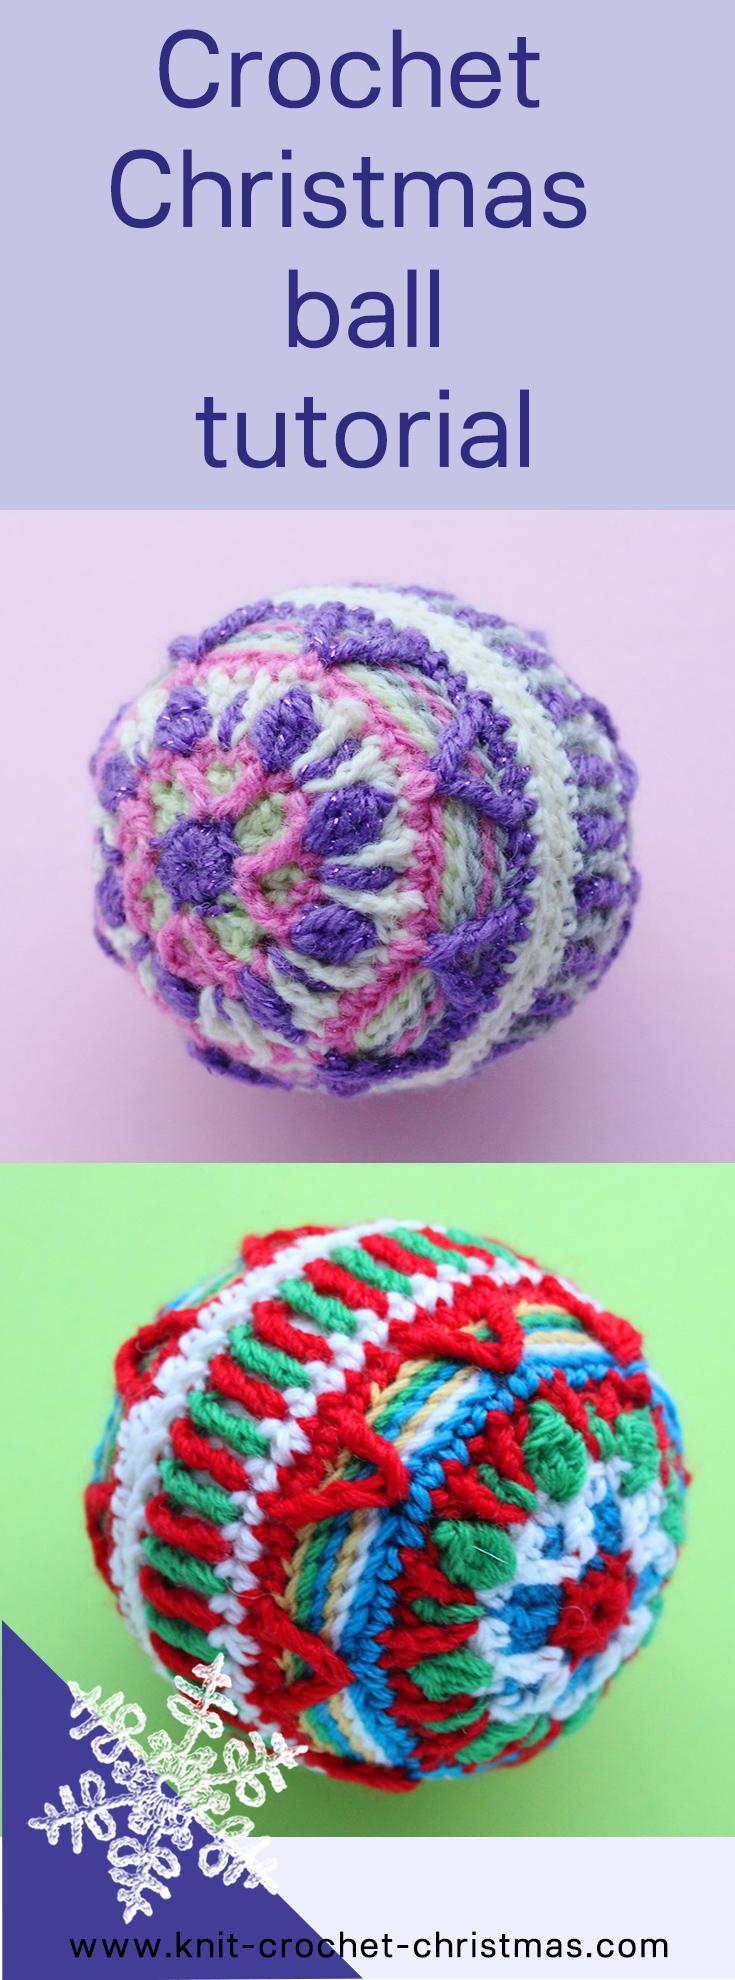 crochet-christmas-baubles-tutorial